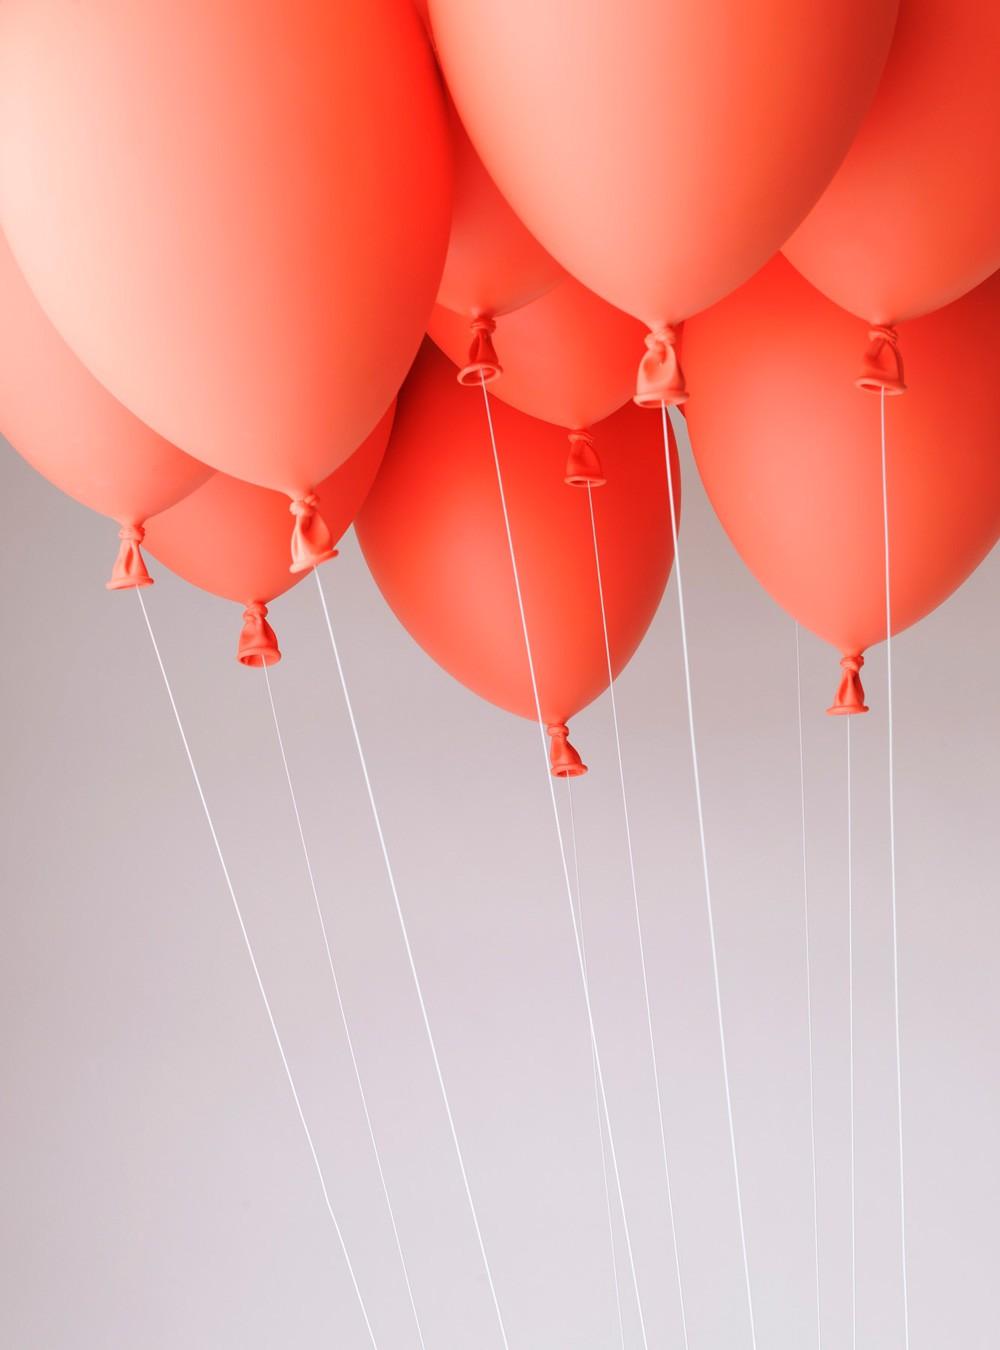 Banc suspendu par des ballons par satoshi itasaka - Banc suspendu ...